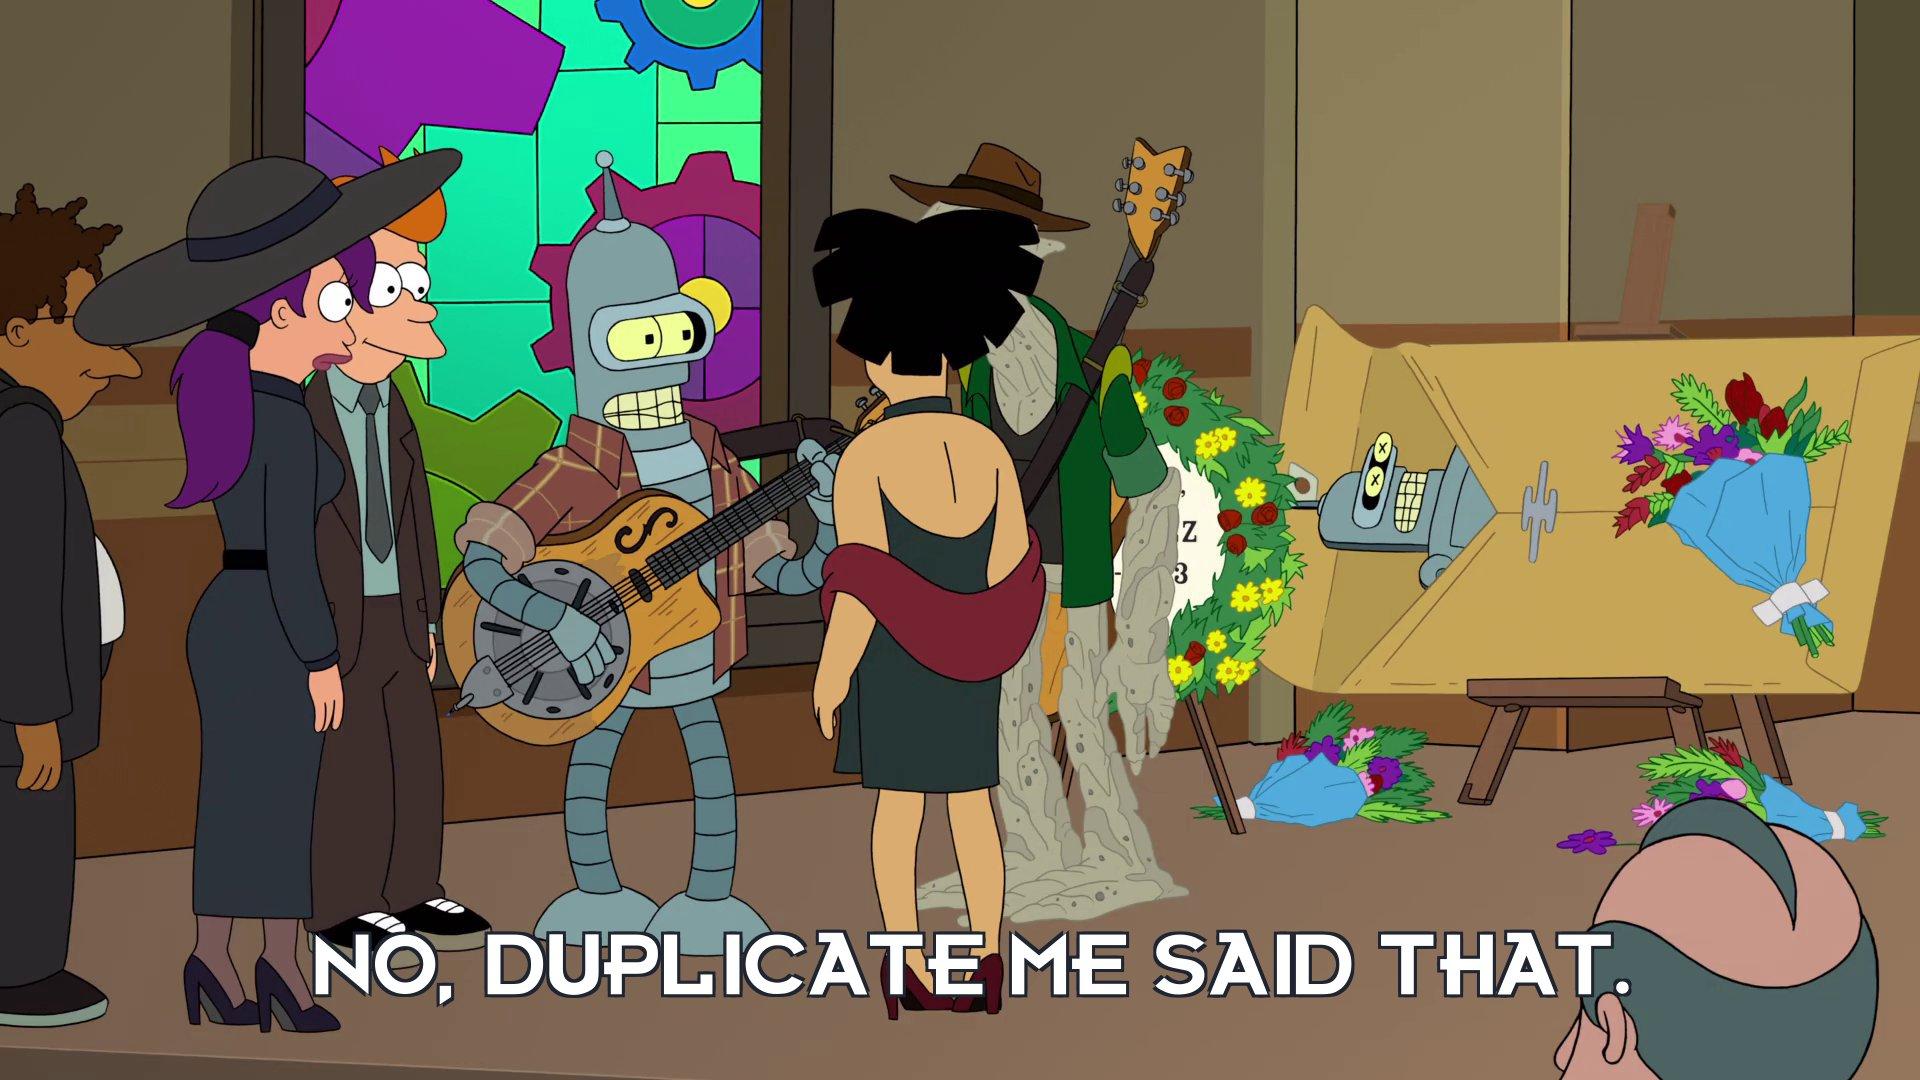 Bender Bending Rodriguez: No, duplicate me said that.